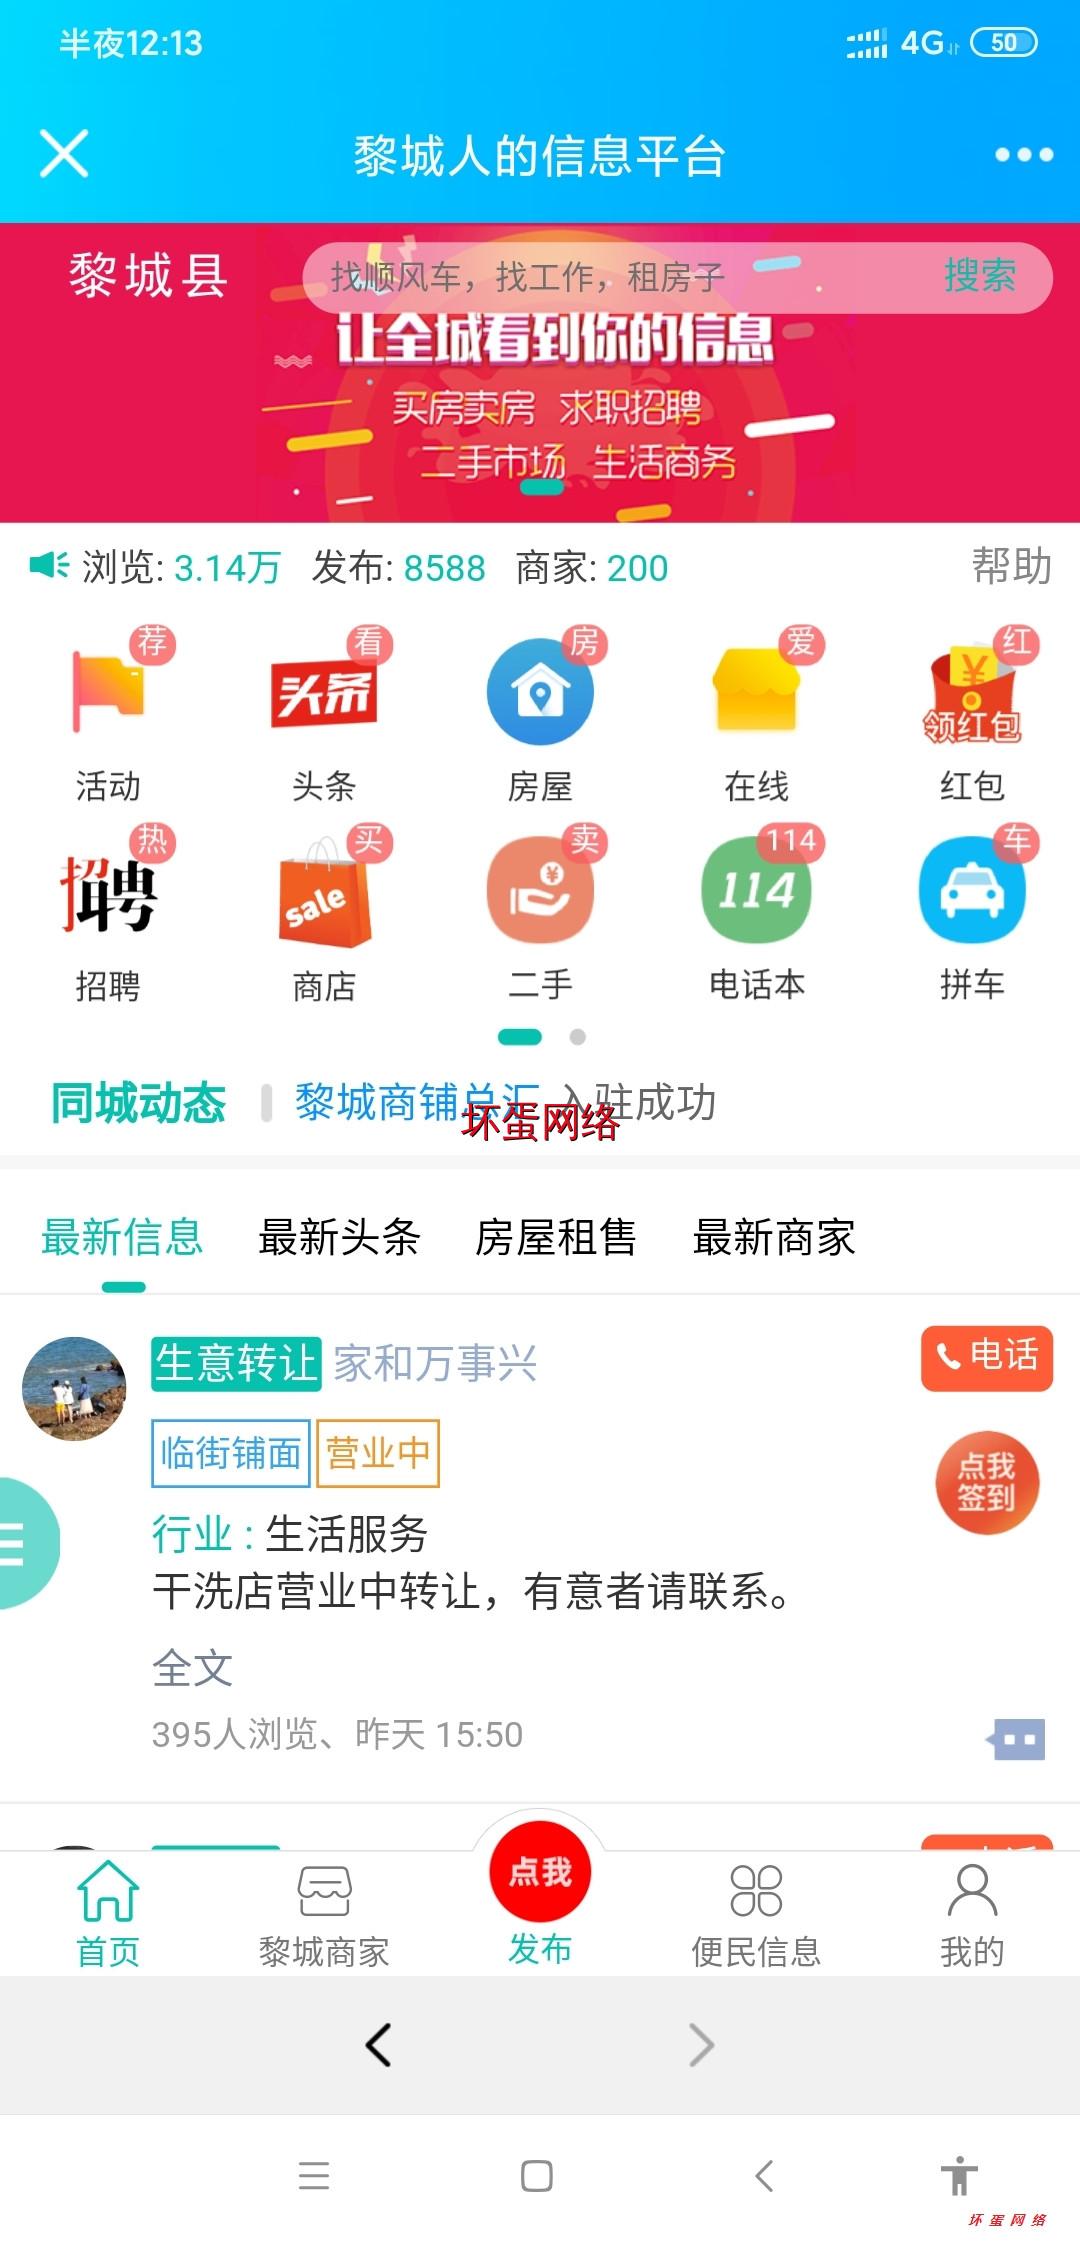 Screenshot_2019-12-25-00-13-44-783_com.tencent.mo.jpg